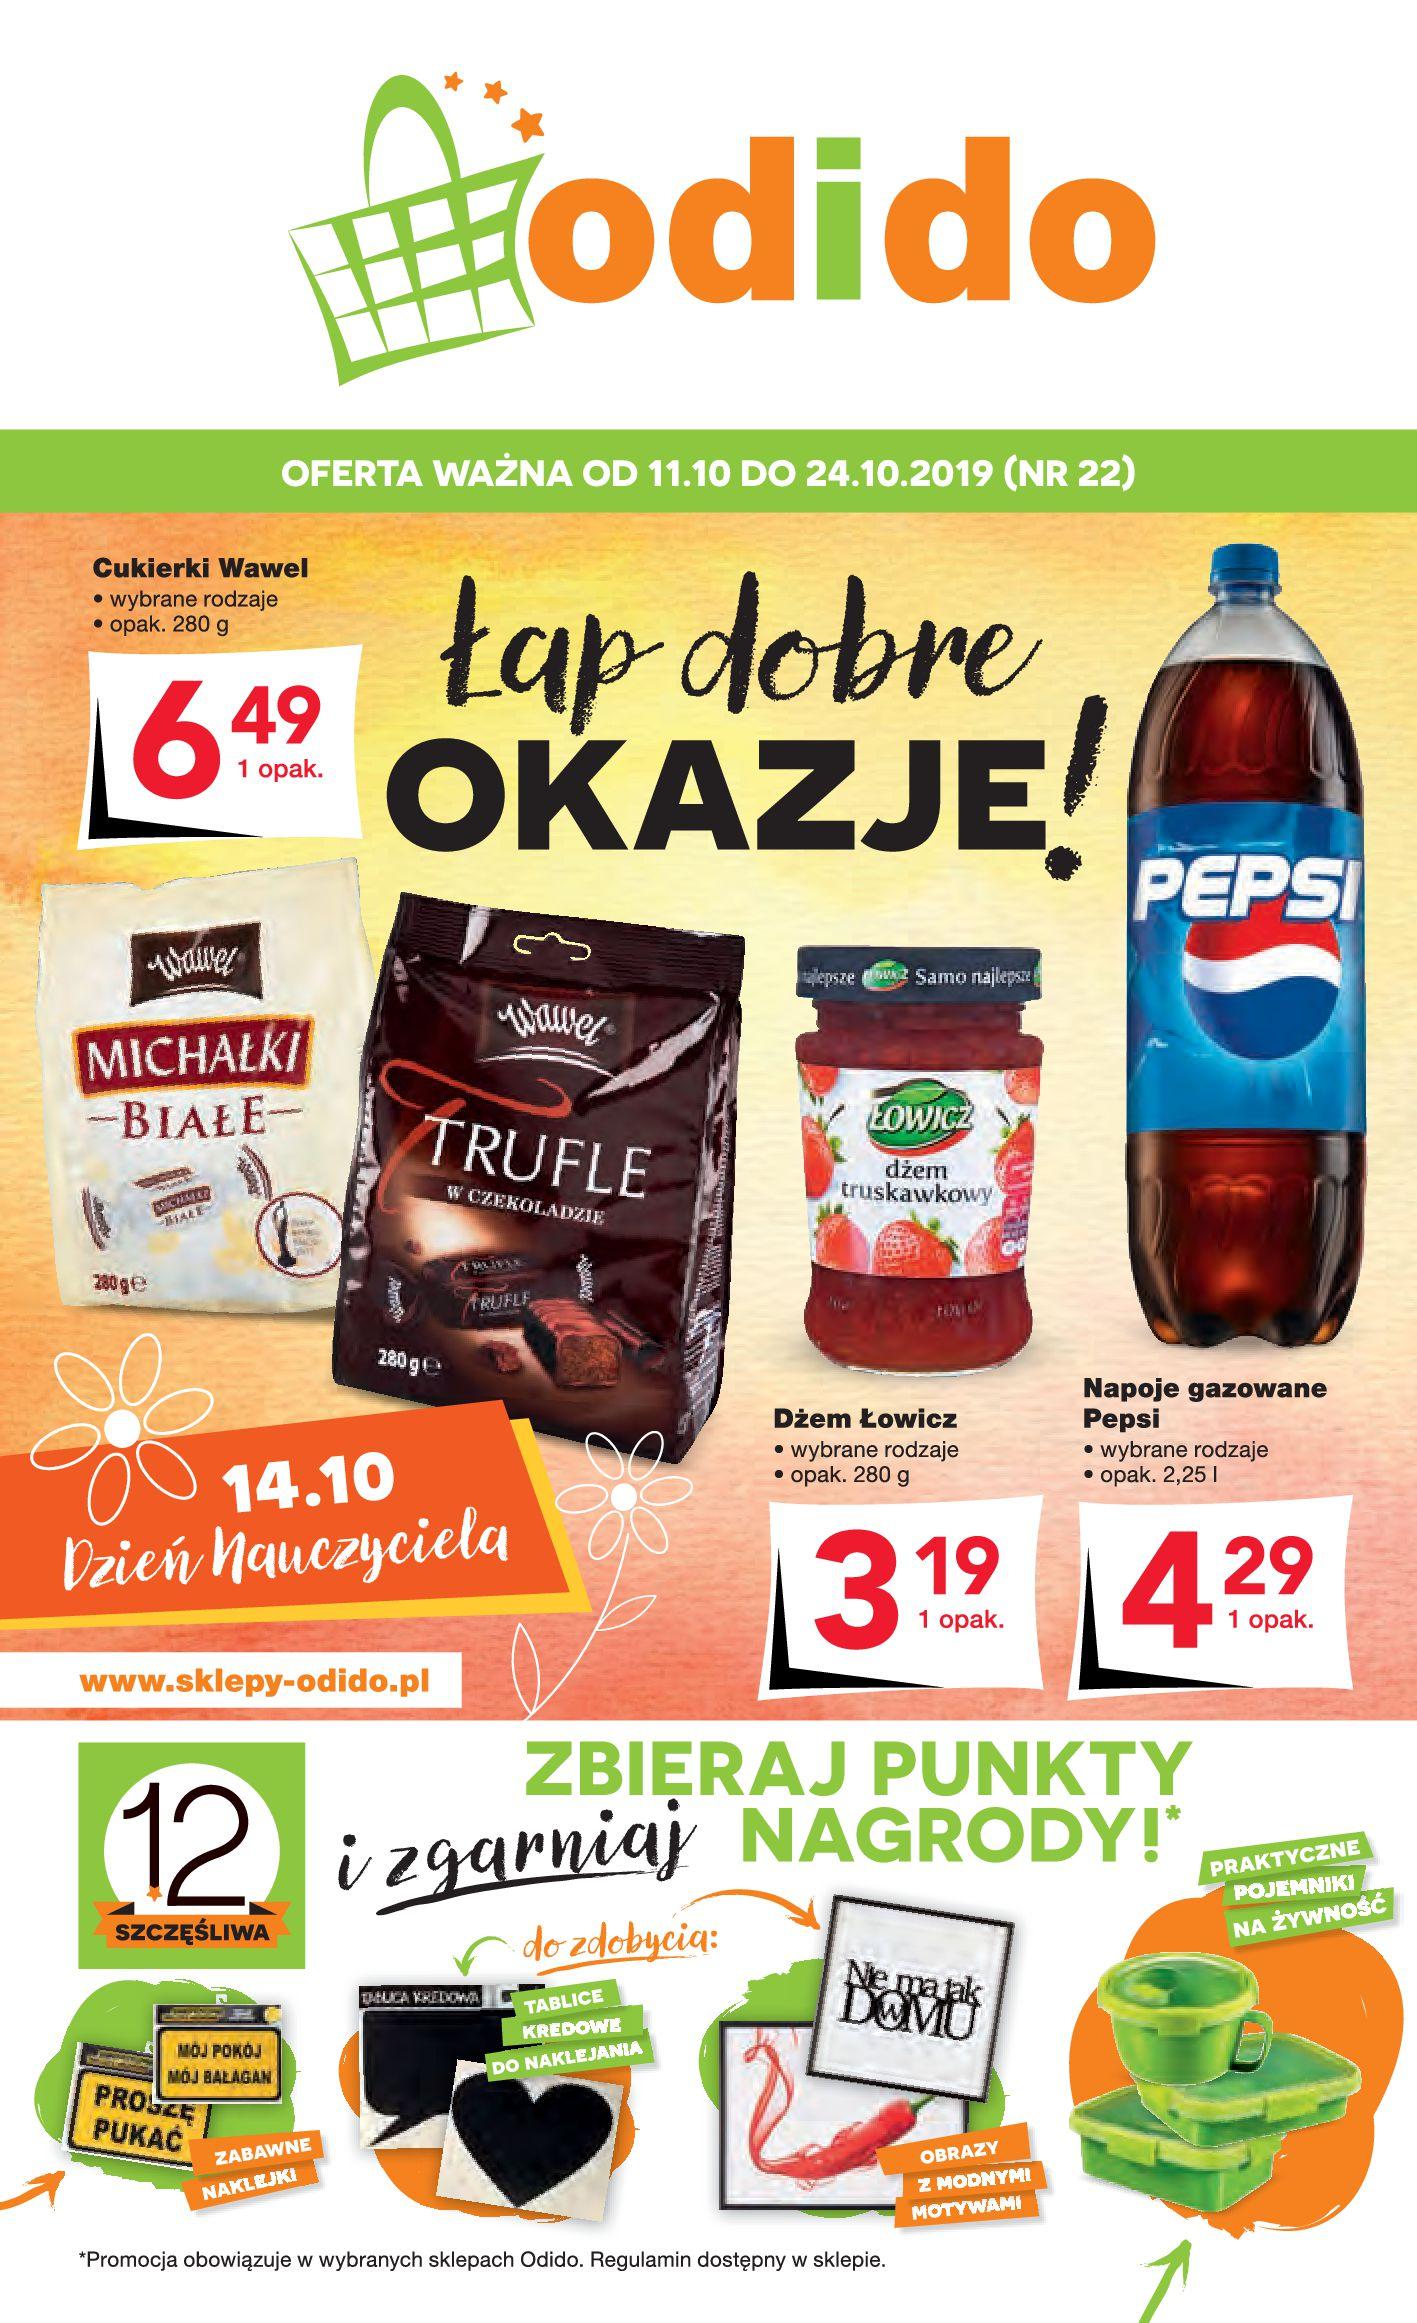 Gazetka Odido - Łap dobre OKAZJE!-10.10.2019-24.10.2019-page-